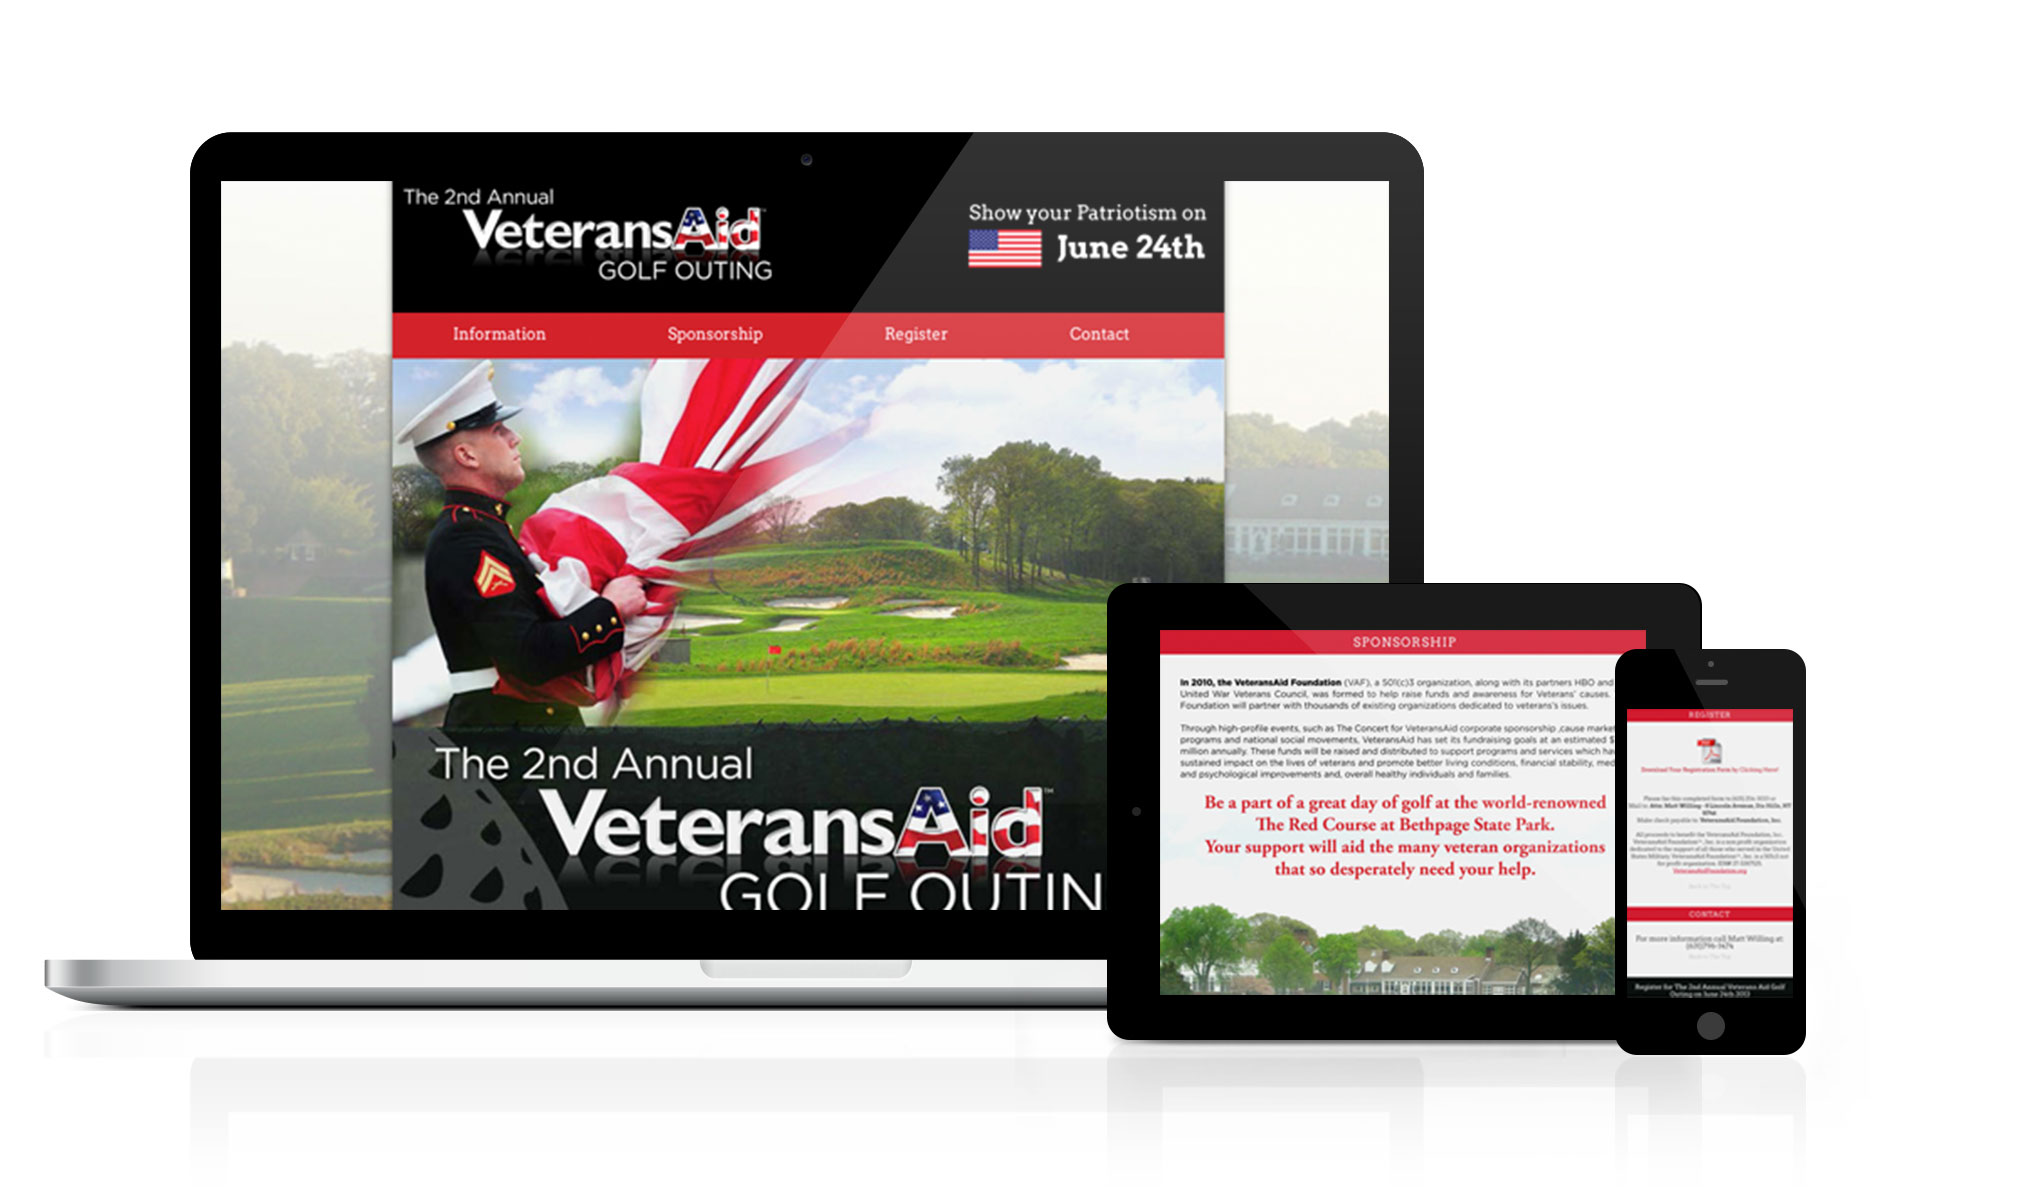 https://www.logicwebmedia.com/wp-content/uploads/top-image-all-new-hands-veterans.jpg